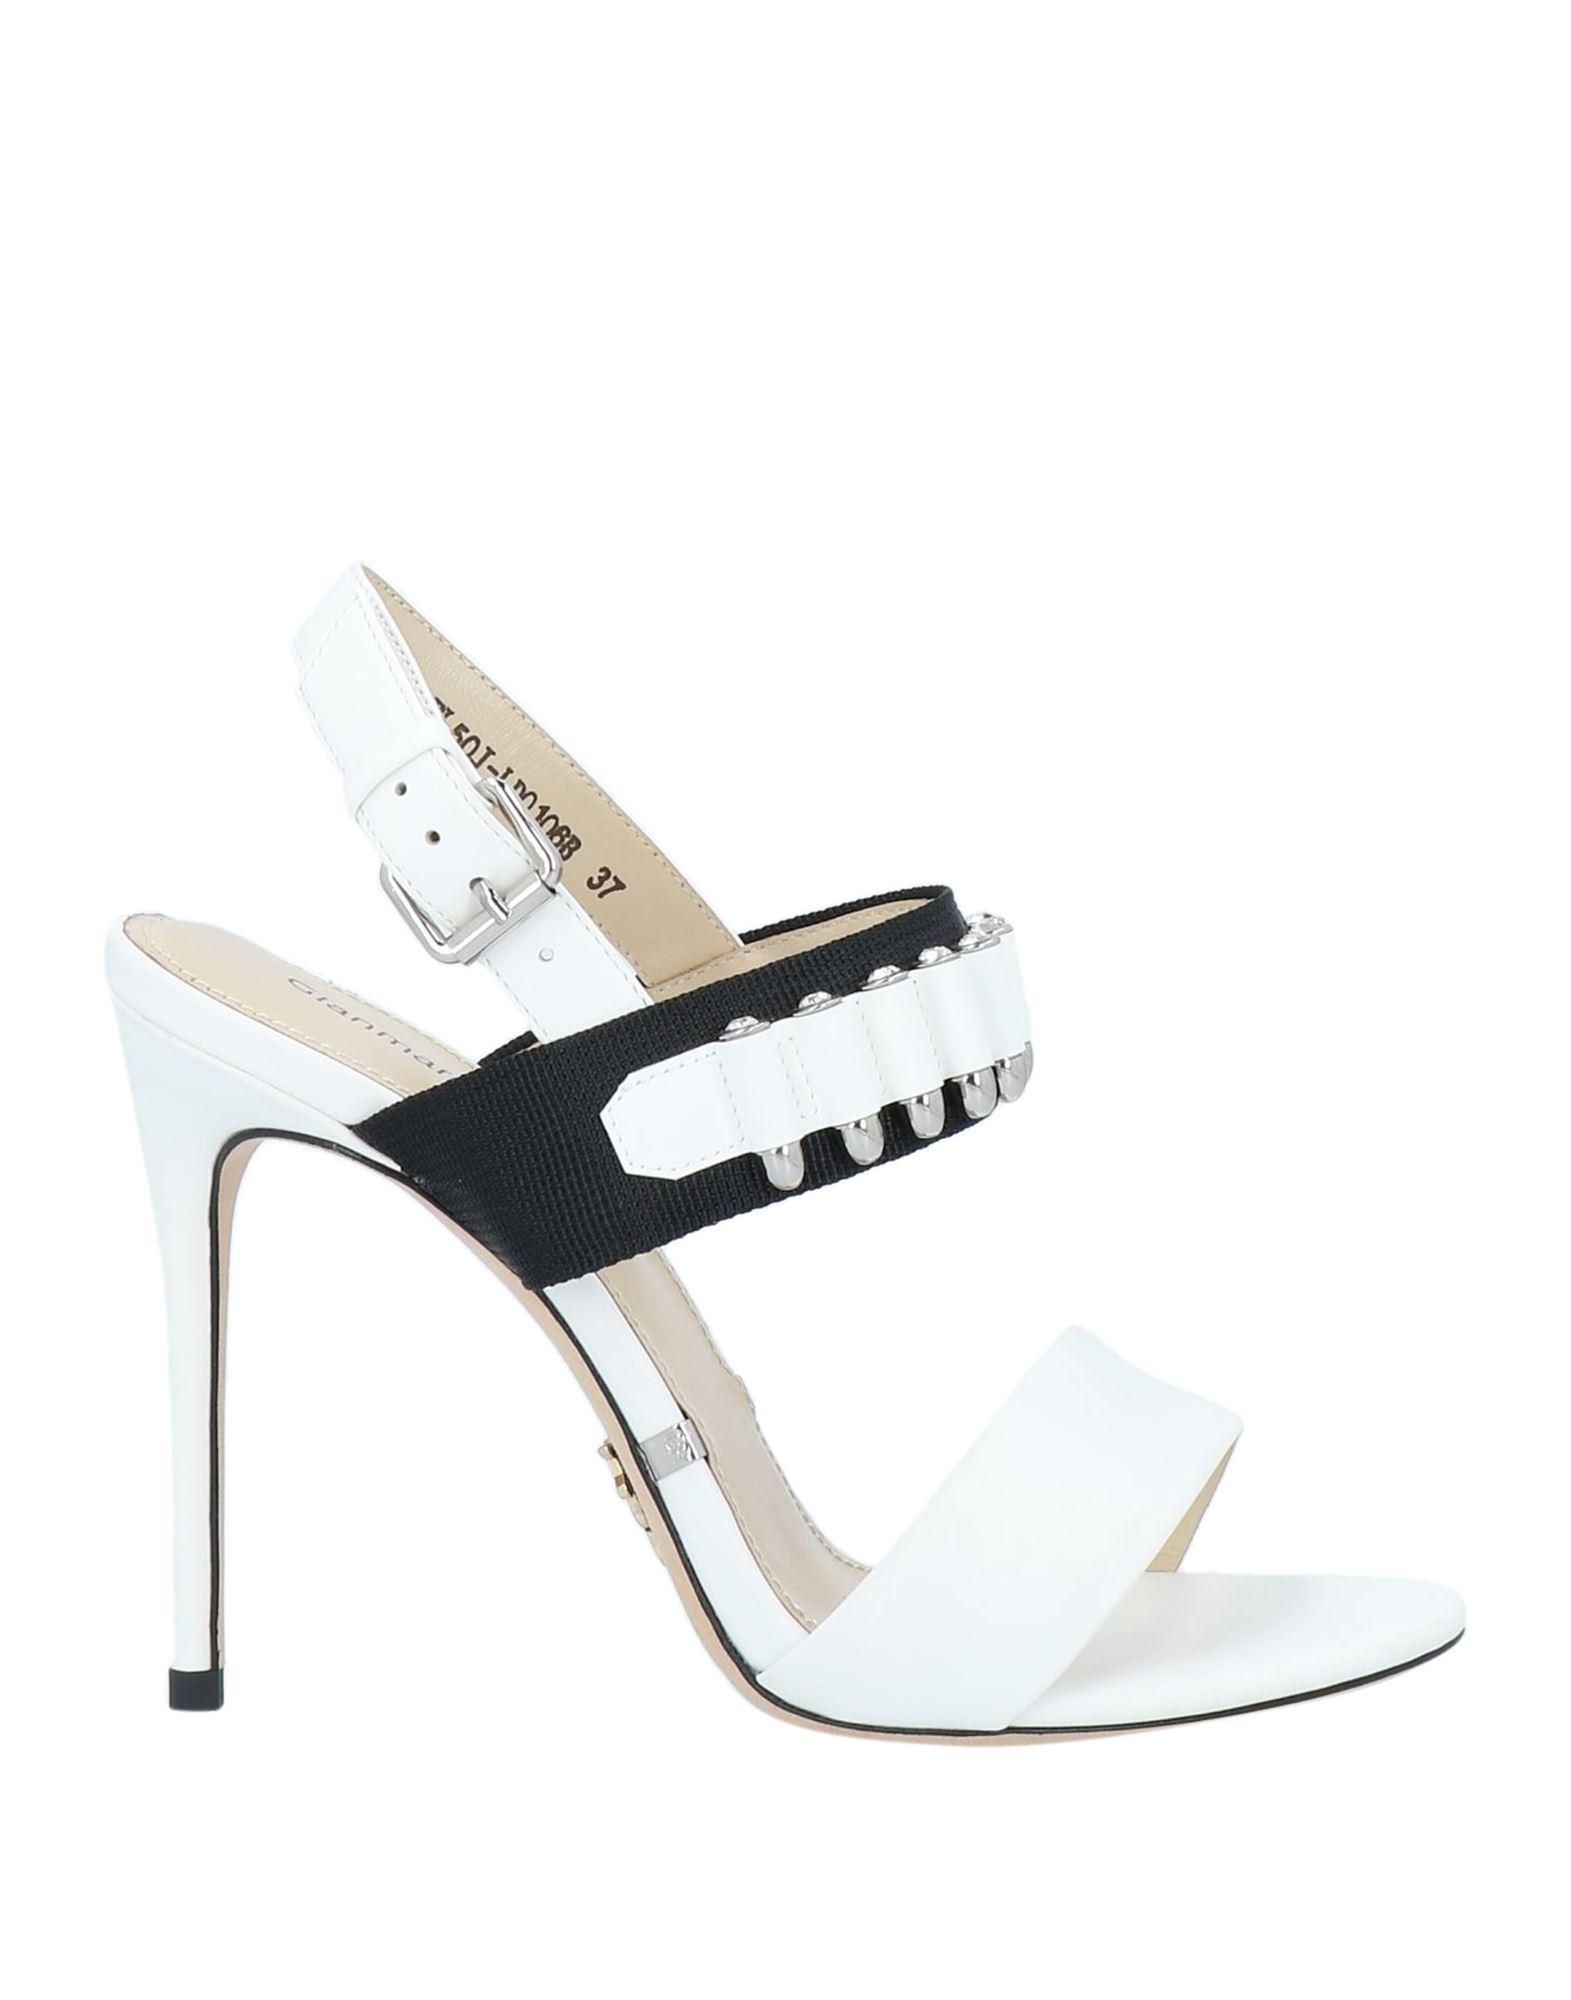 Gianmarco Lorenzi Sandals In White